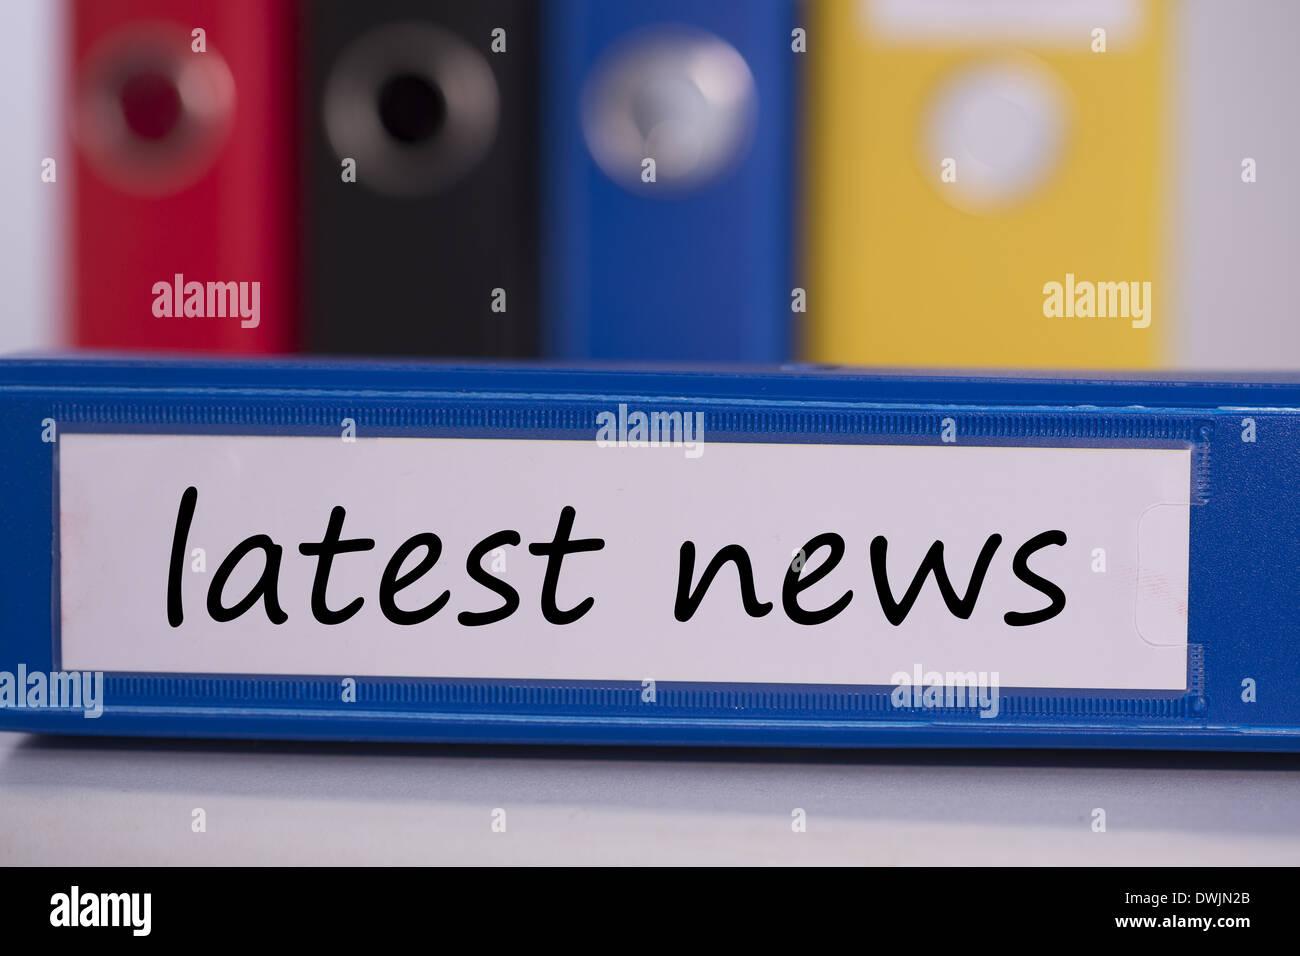 Latest news on blue business binder - Stock Image